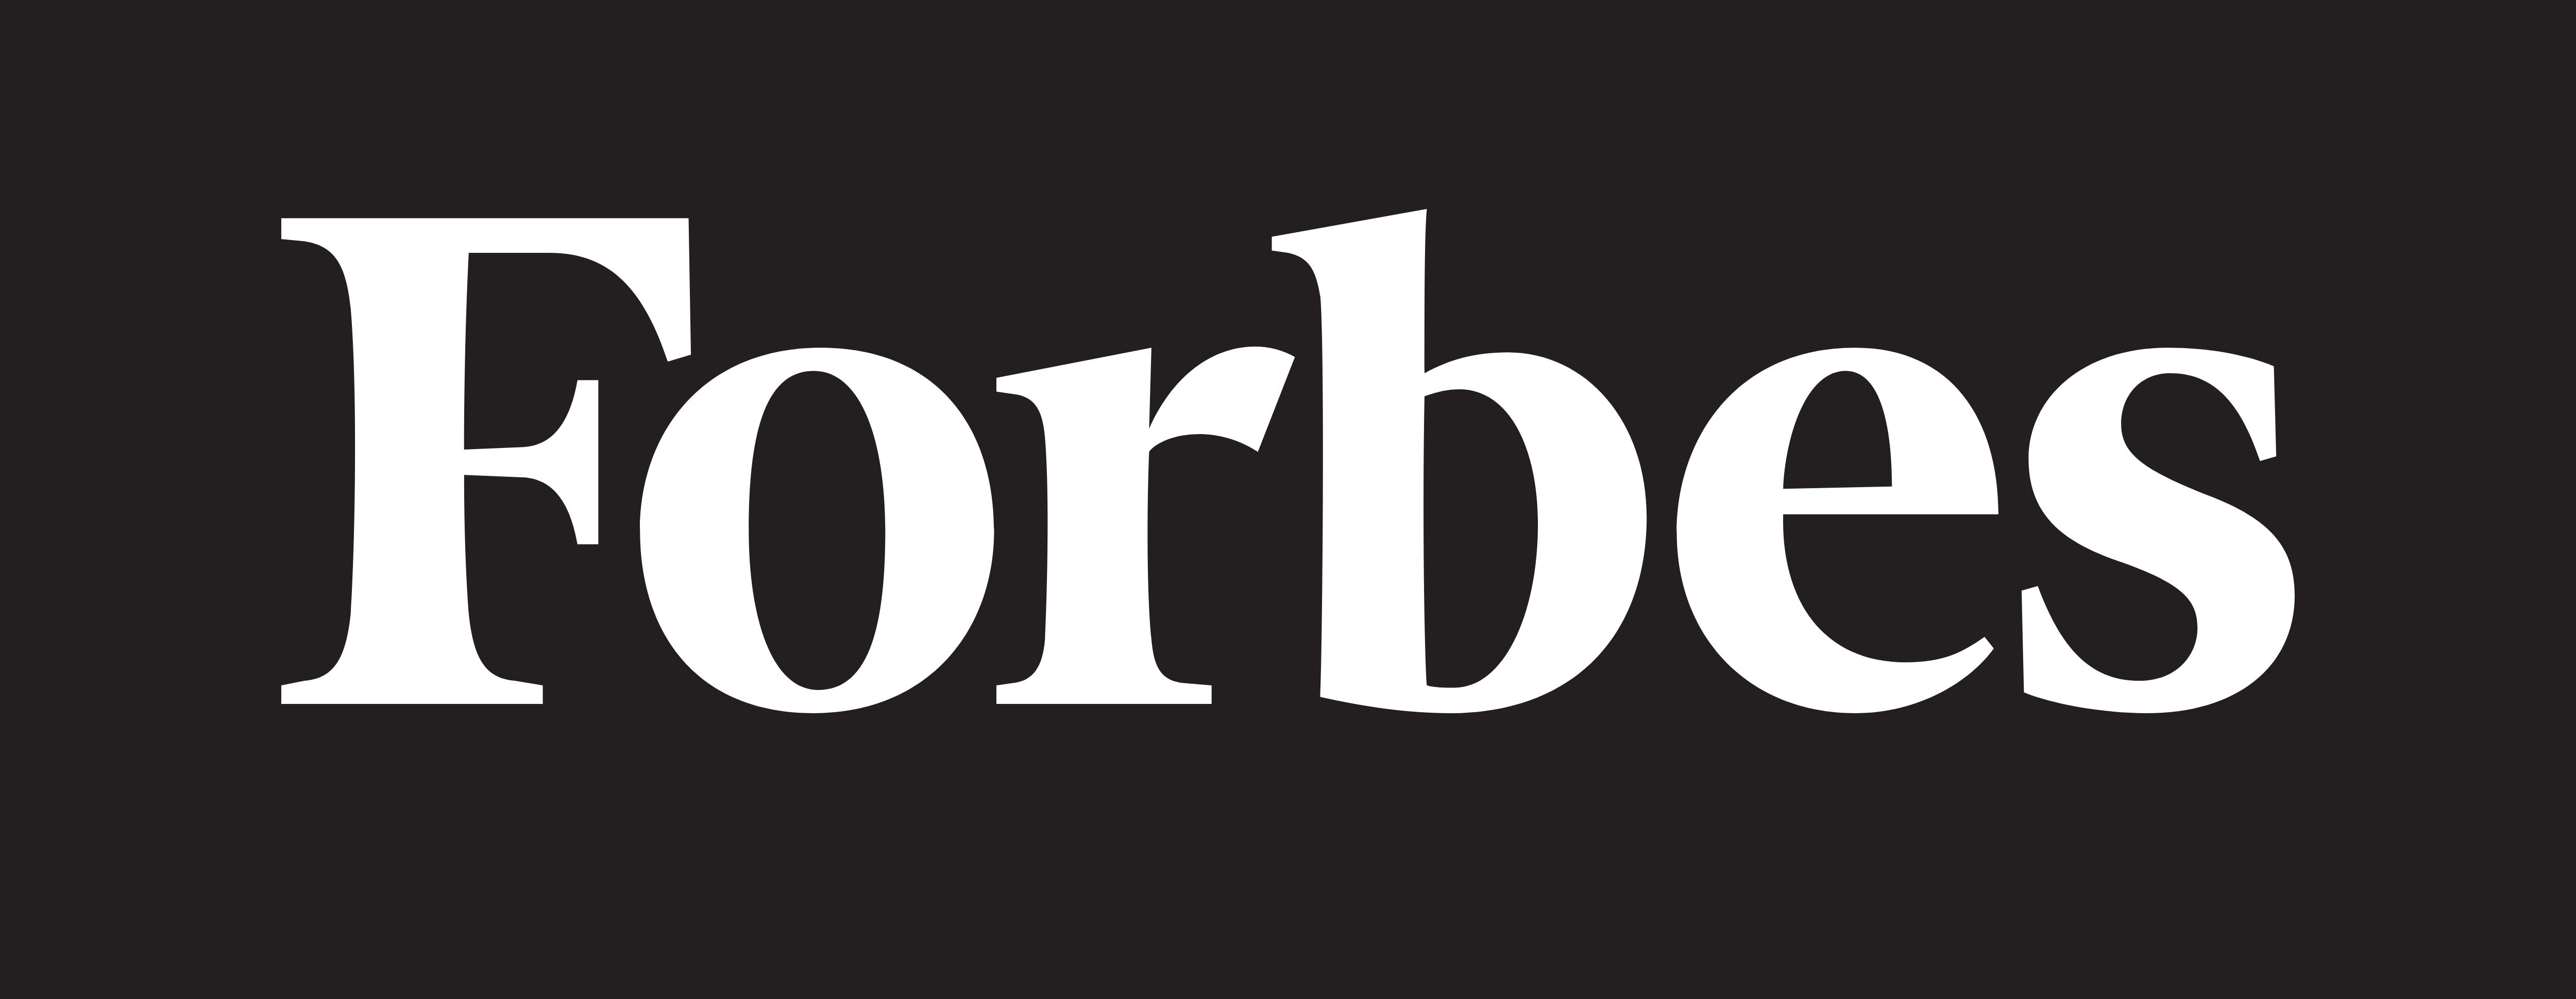 Pimpinella ve Forbes